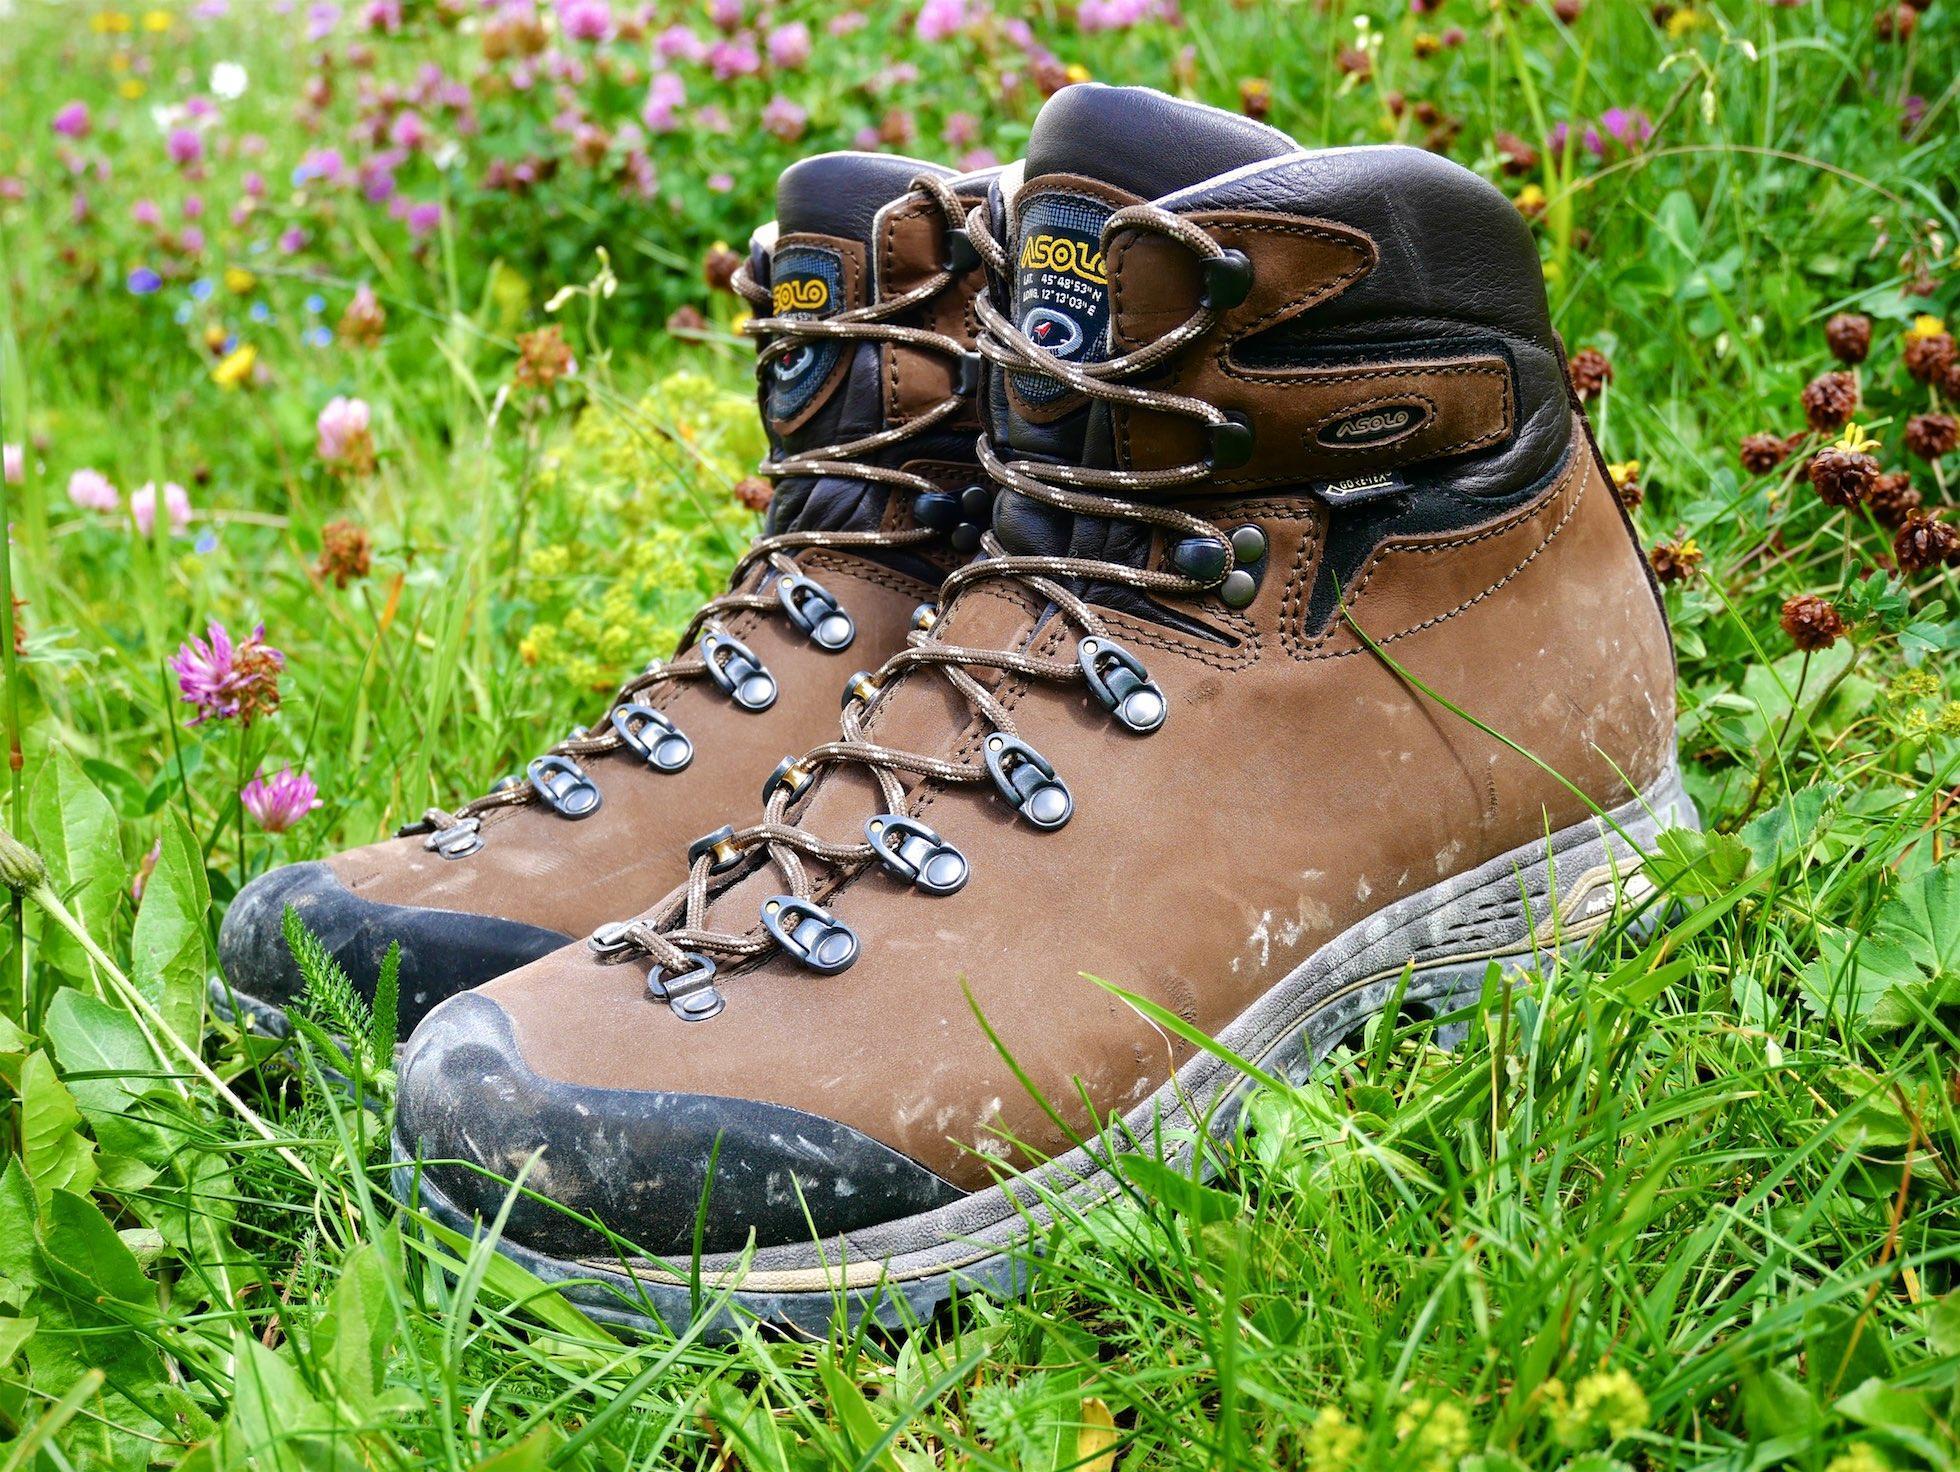 ff5c9915823d Recenzia  Turistické topánky Asolo Fandango DUO GV